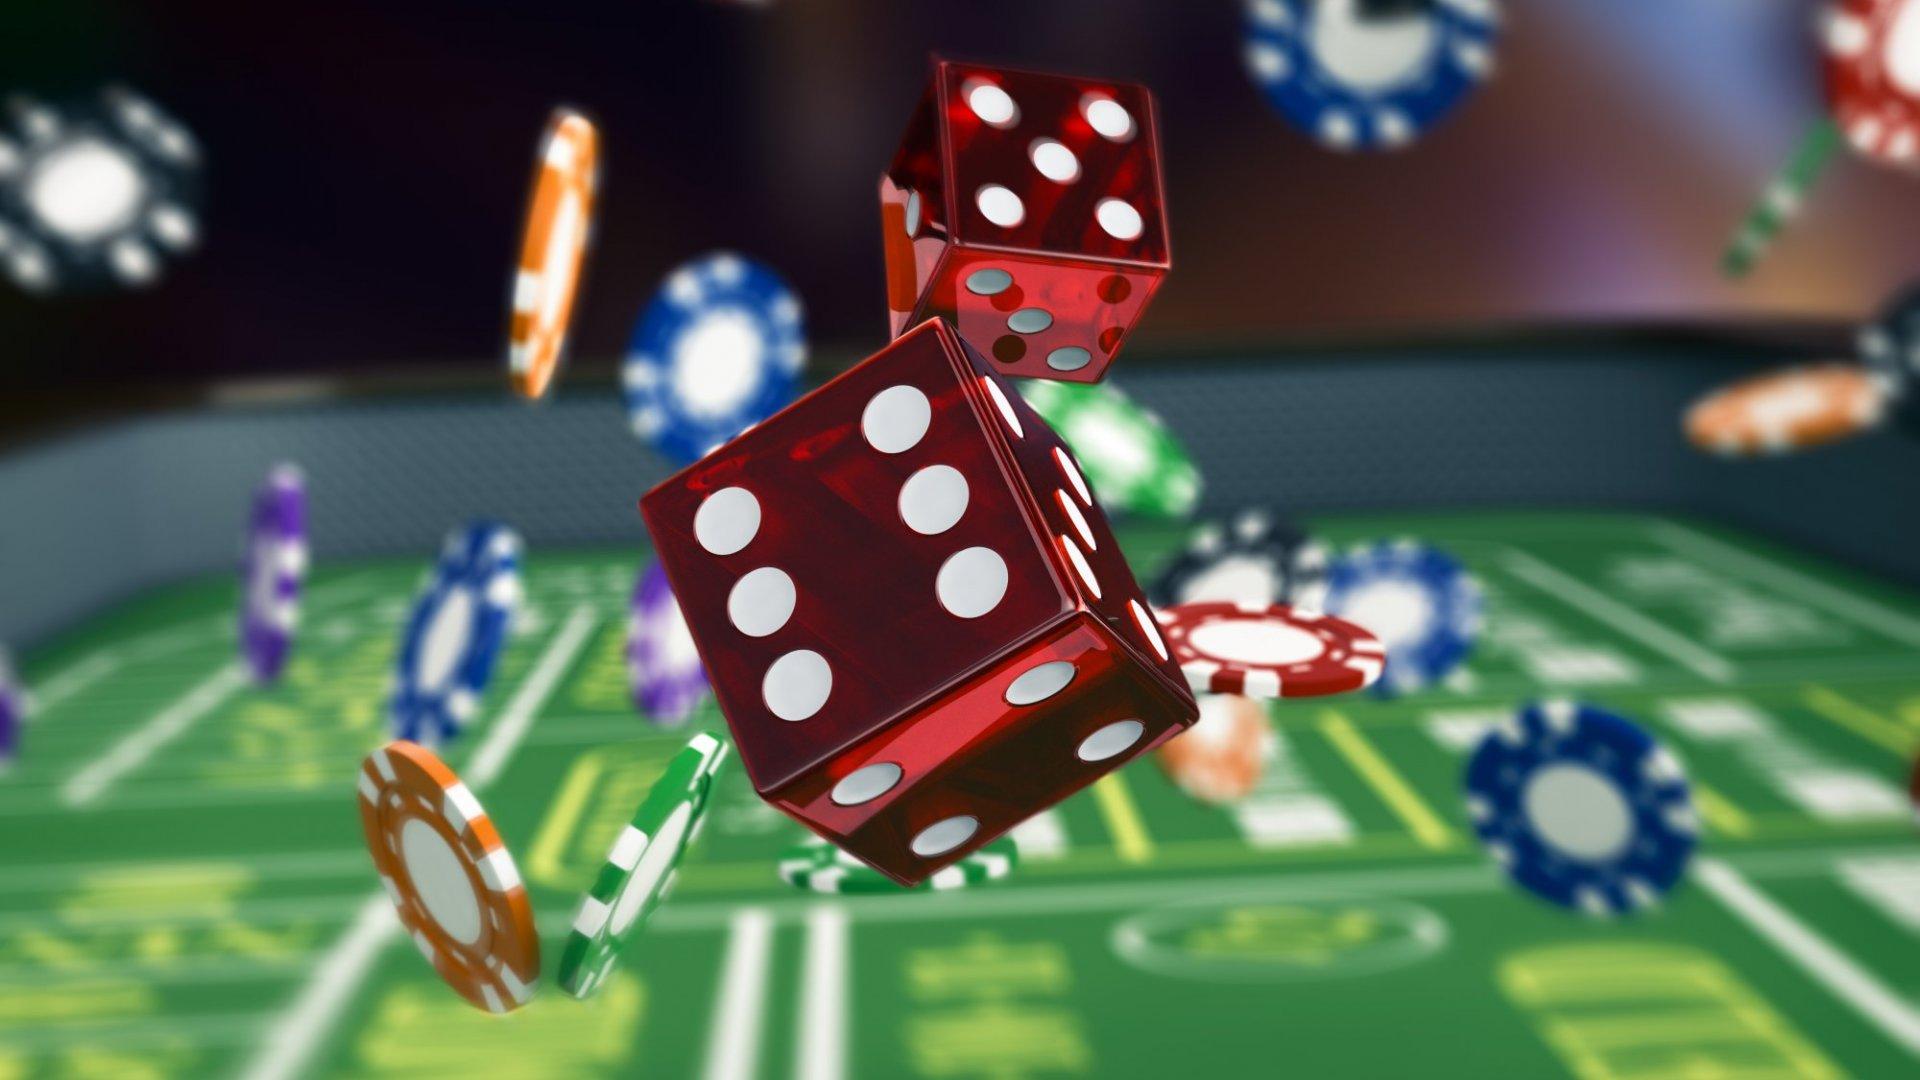 Betaland Wiser Online Casino : I migliori casinò online del 2020